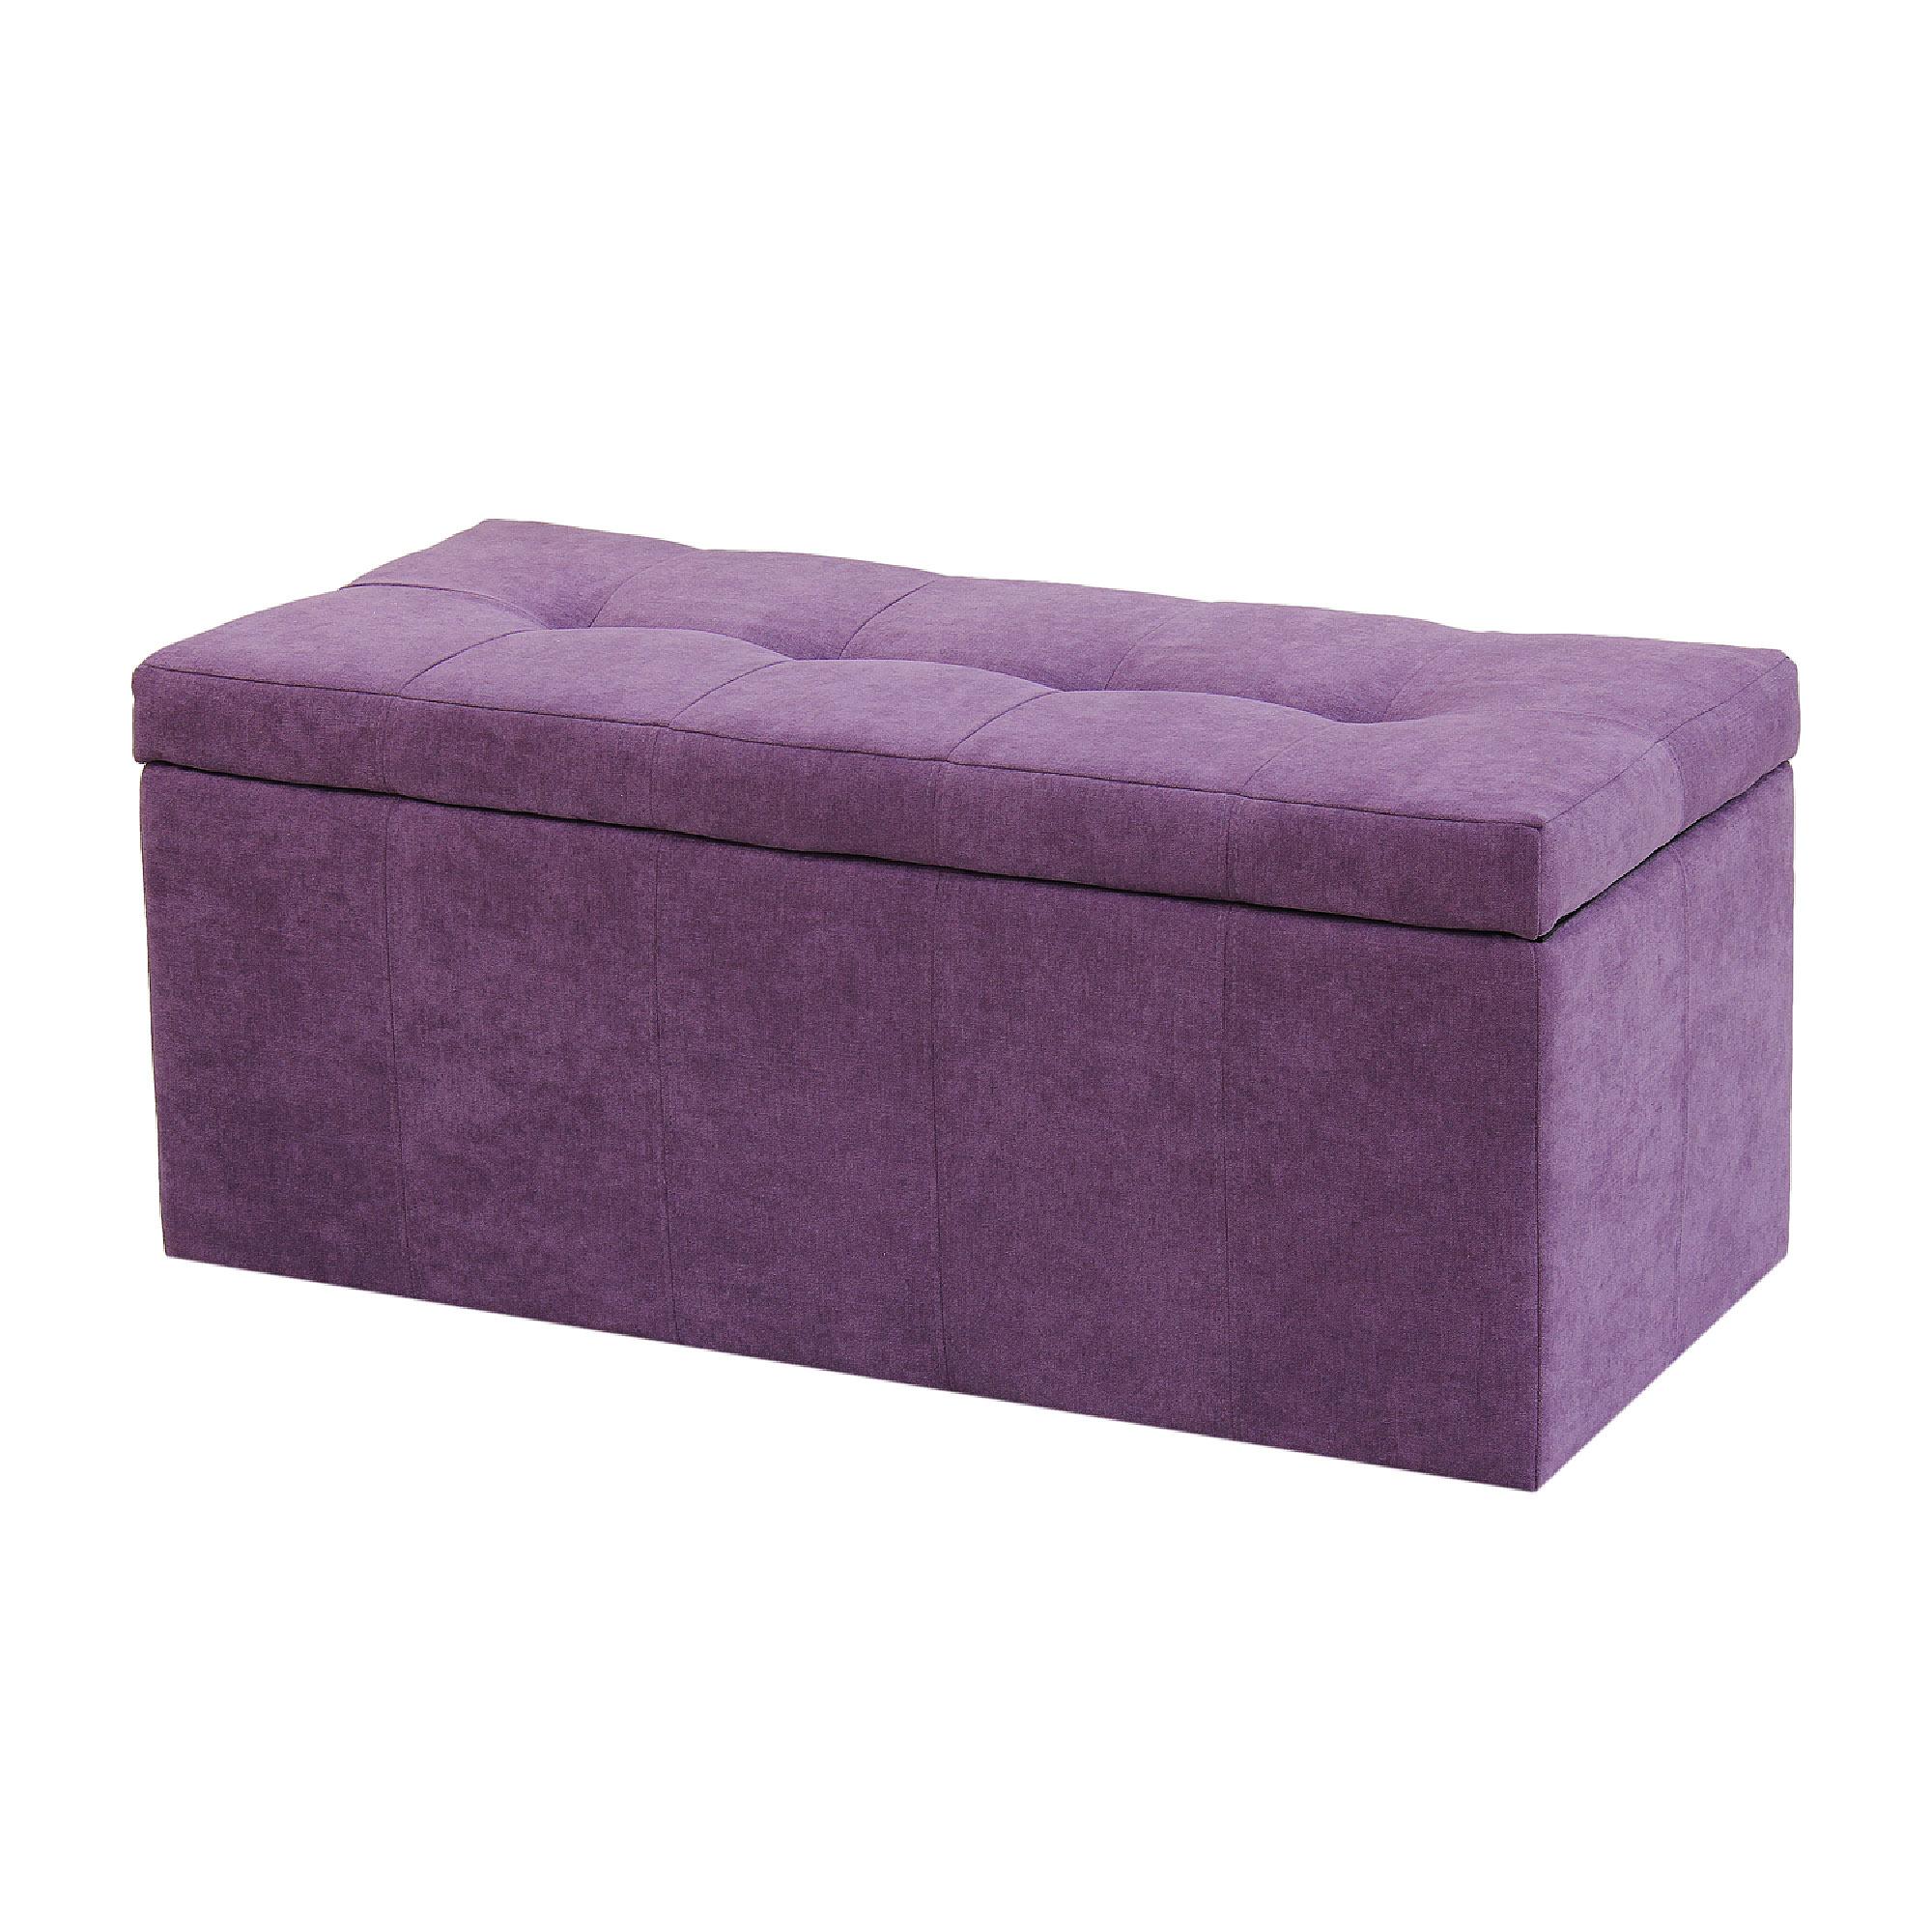 Банкетка Dreambag лонг фиолетовый велюр 100х46х46